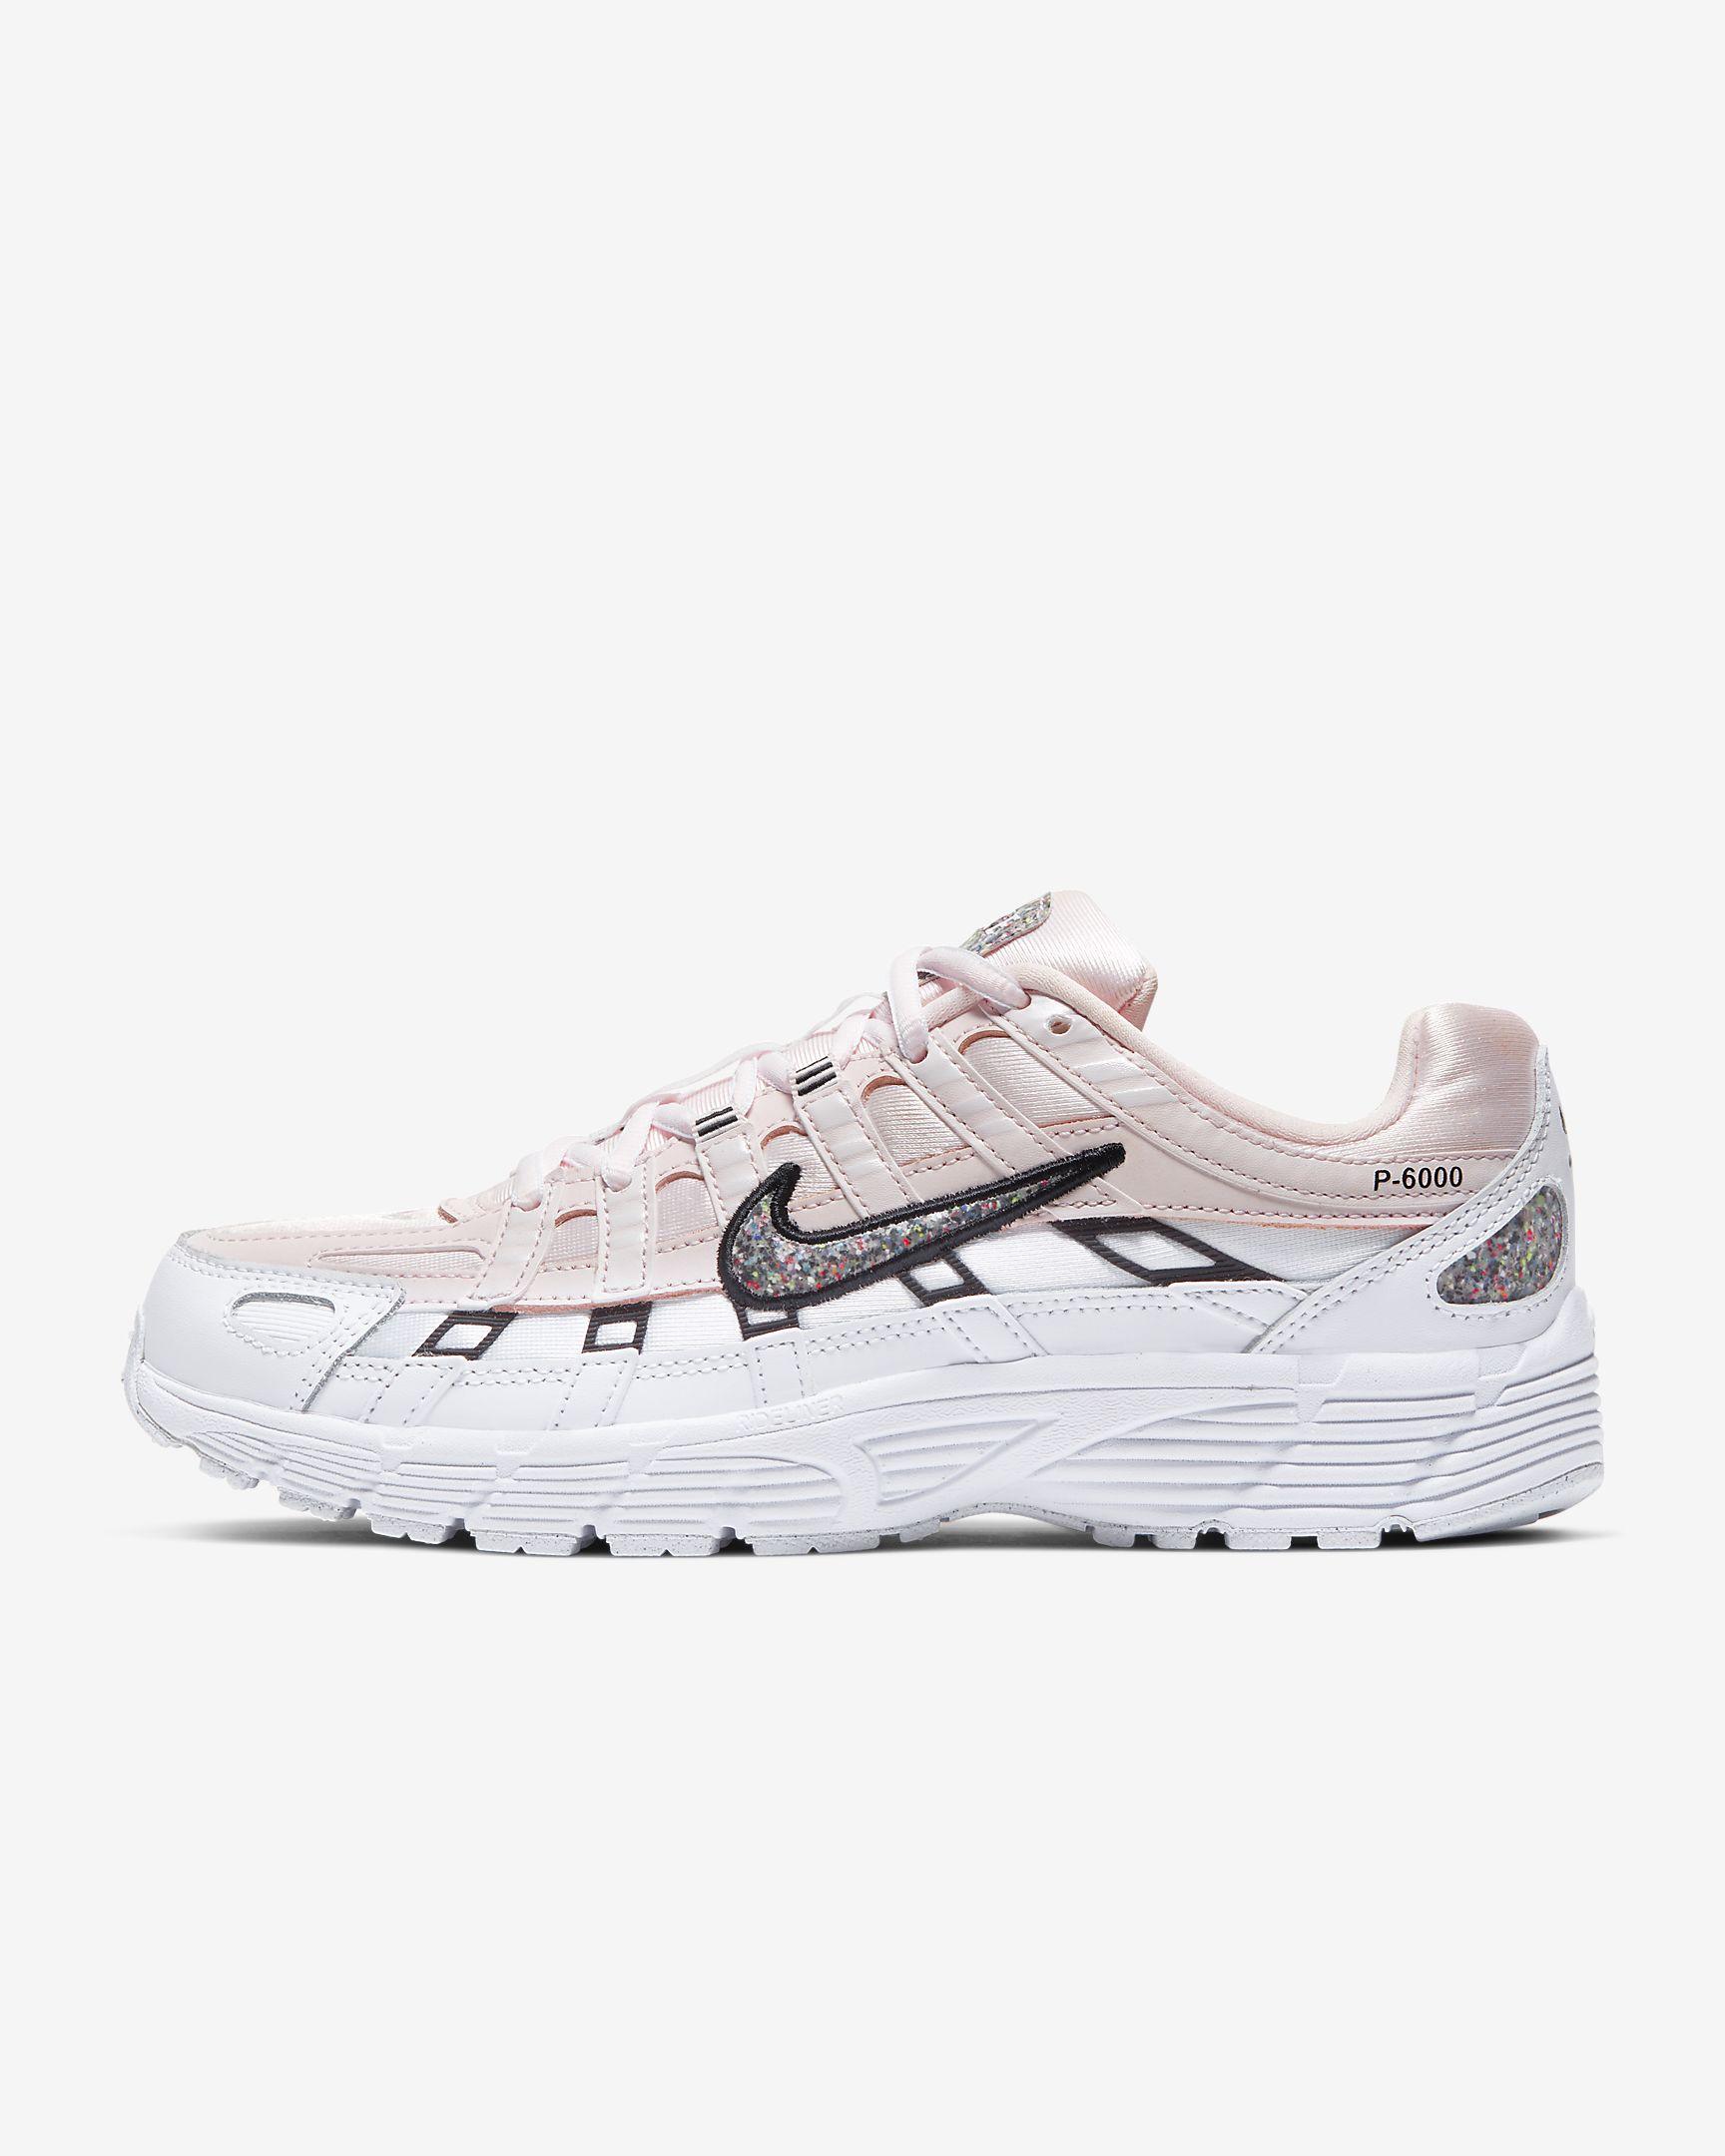 Zapatillas rosas con detalles glitter